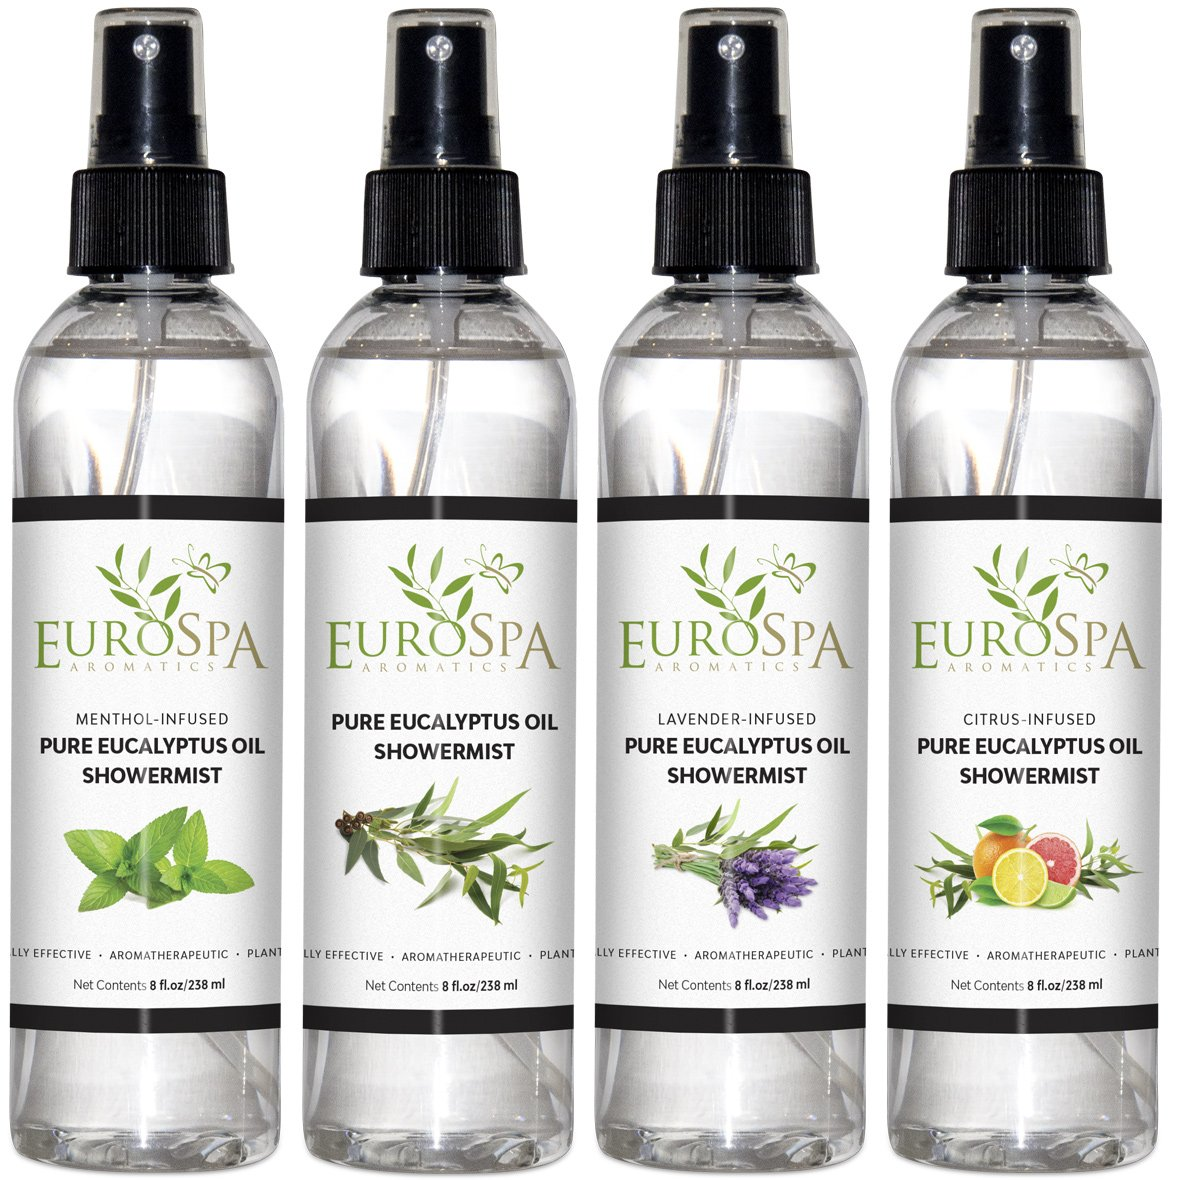 EuroSpa Aromatics Pure Eucalyptus Oil ShowerMist and Steam Room Spray, All-Natural Premium Aromatherapy Essential Oils - Variety 4 Pack - 8 oz Each